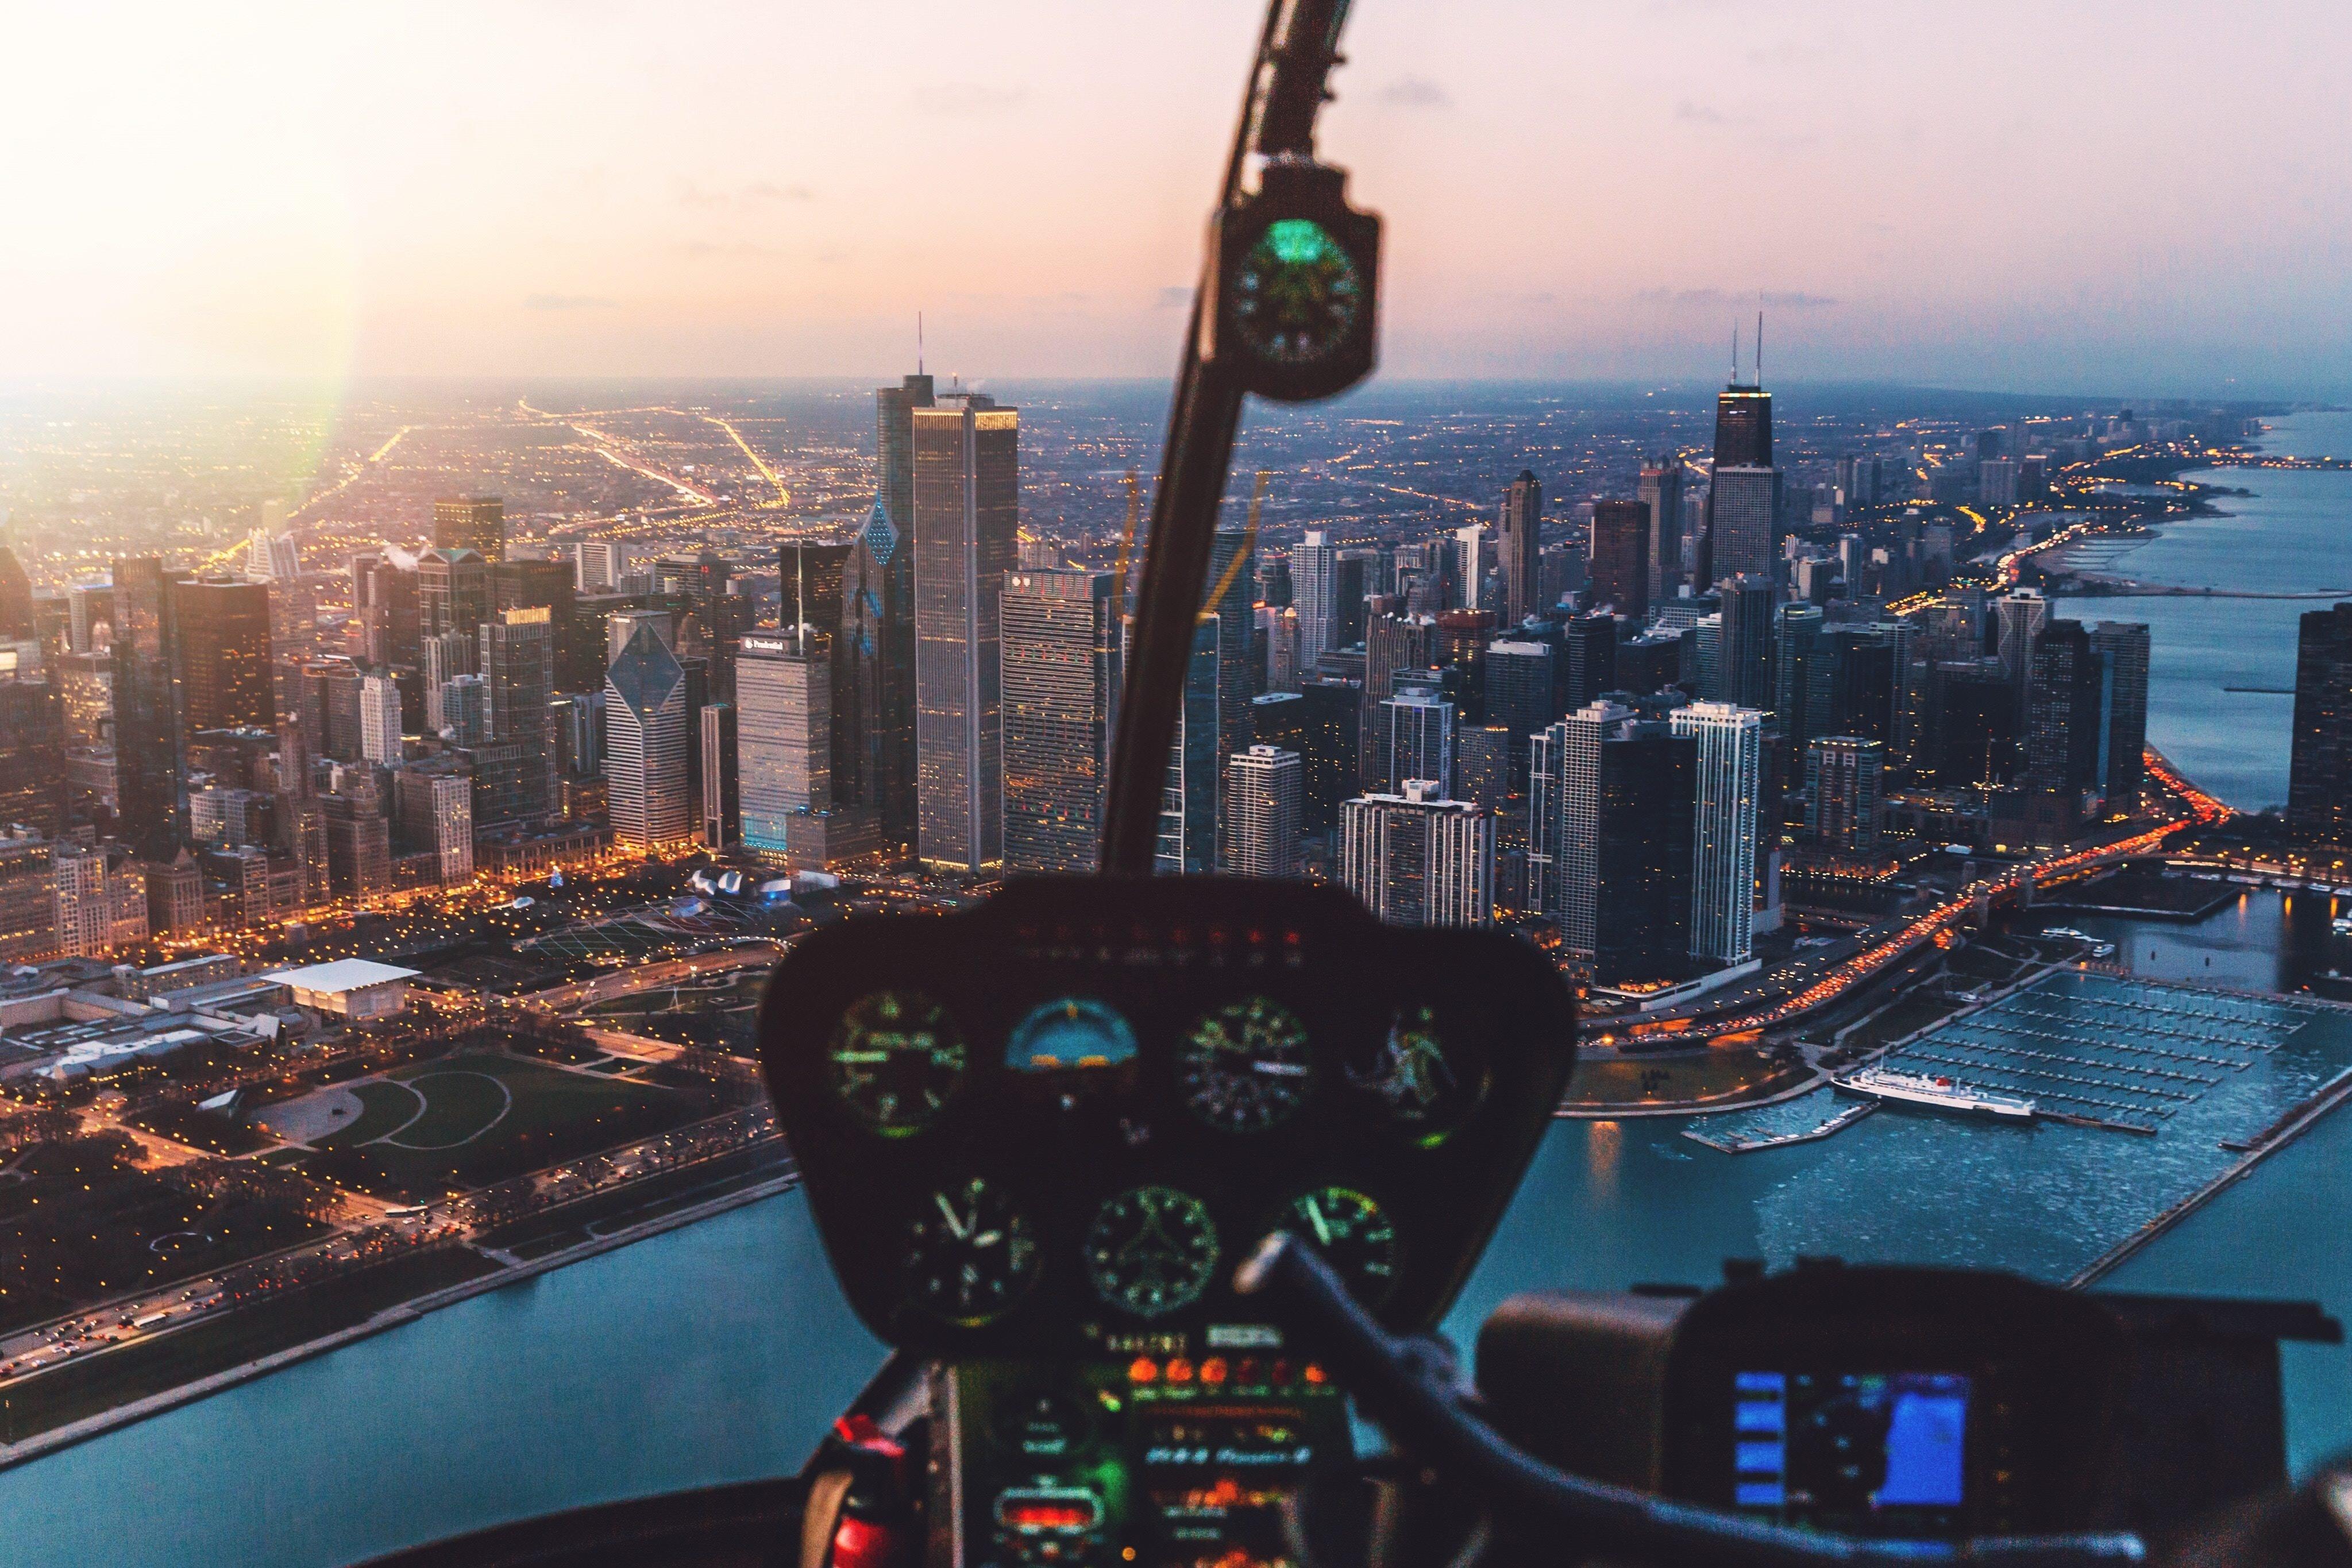 City view from cockpit 4k wallpaper - 4k cockpit wallpaper ...